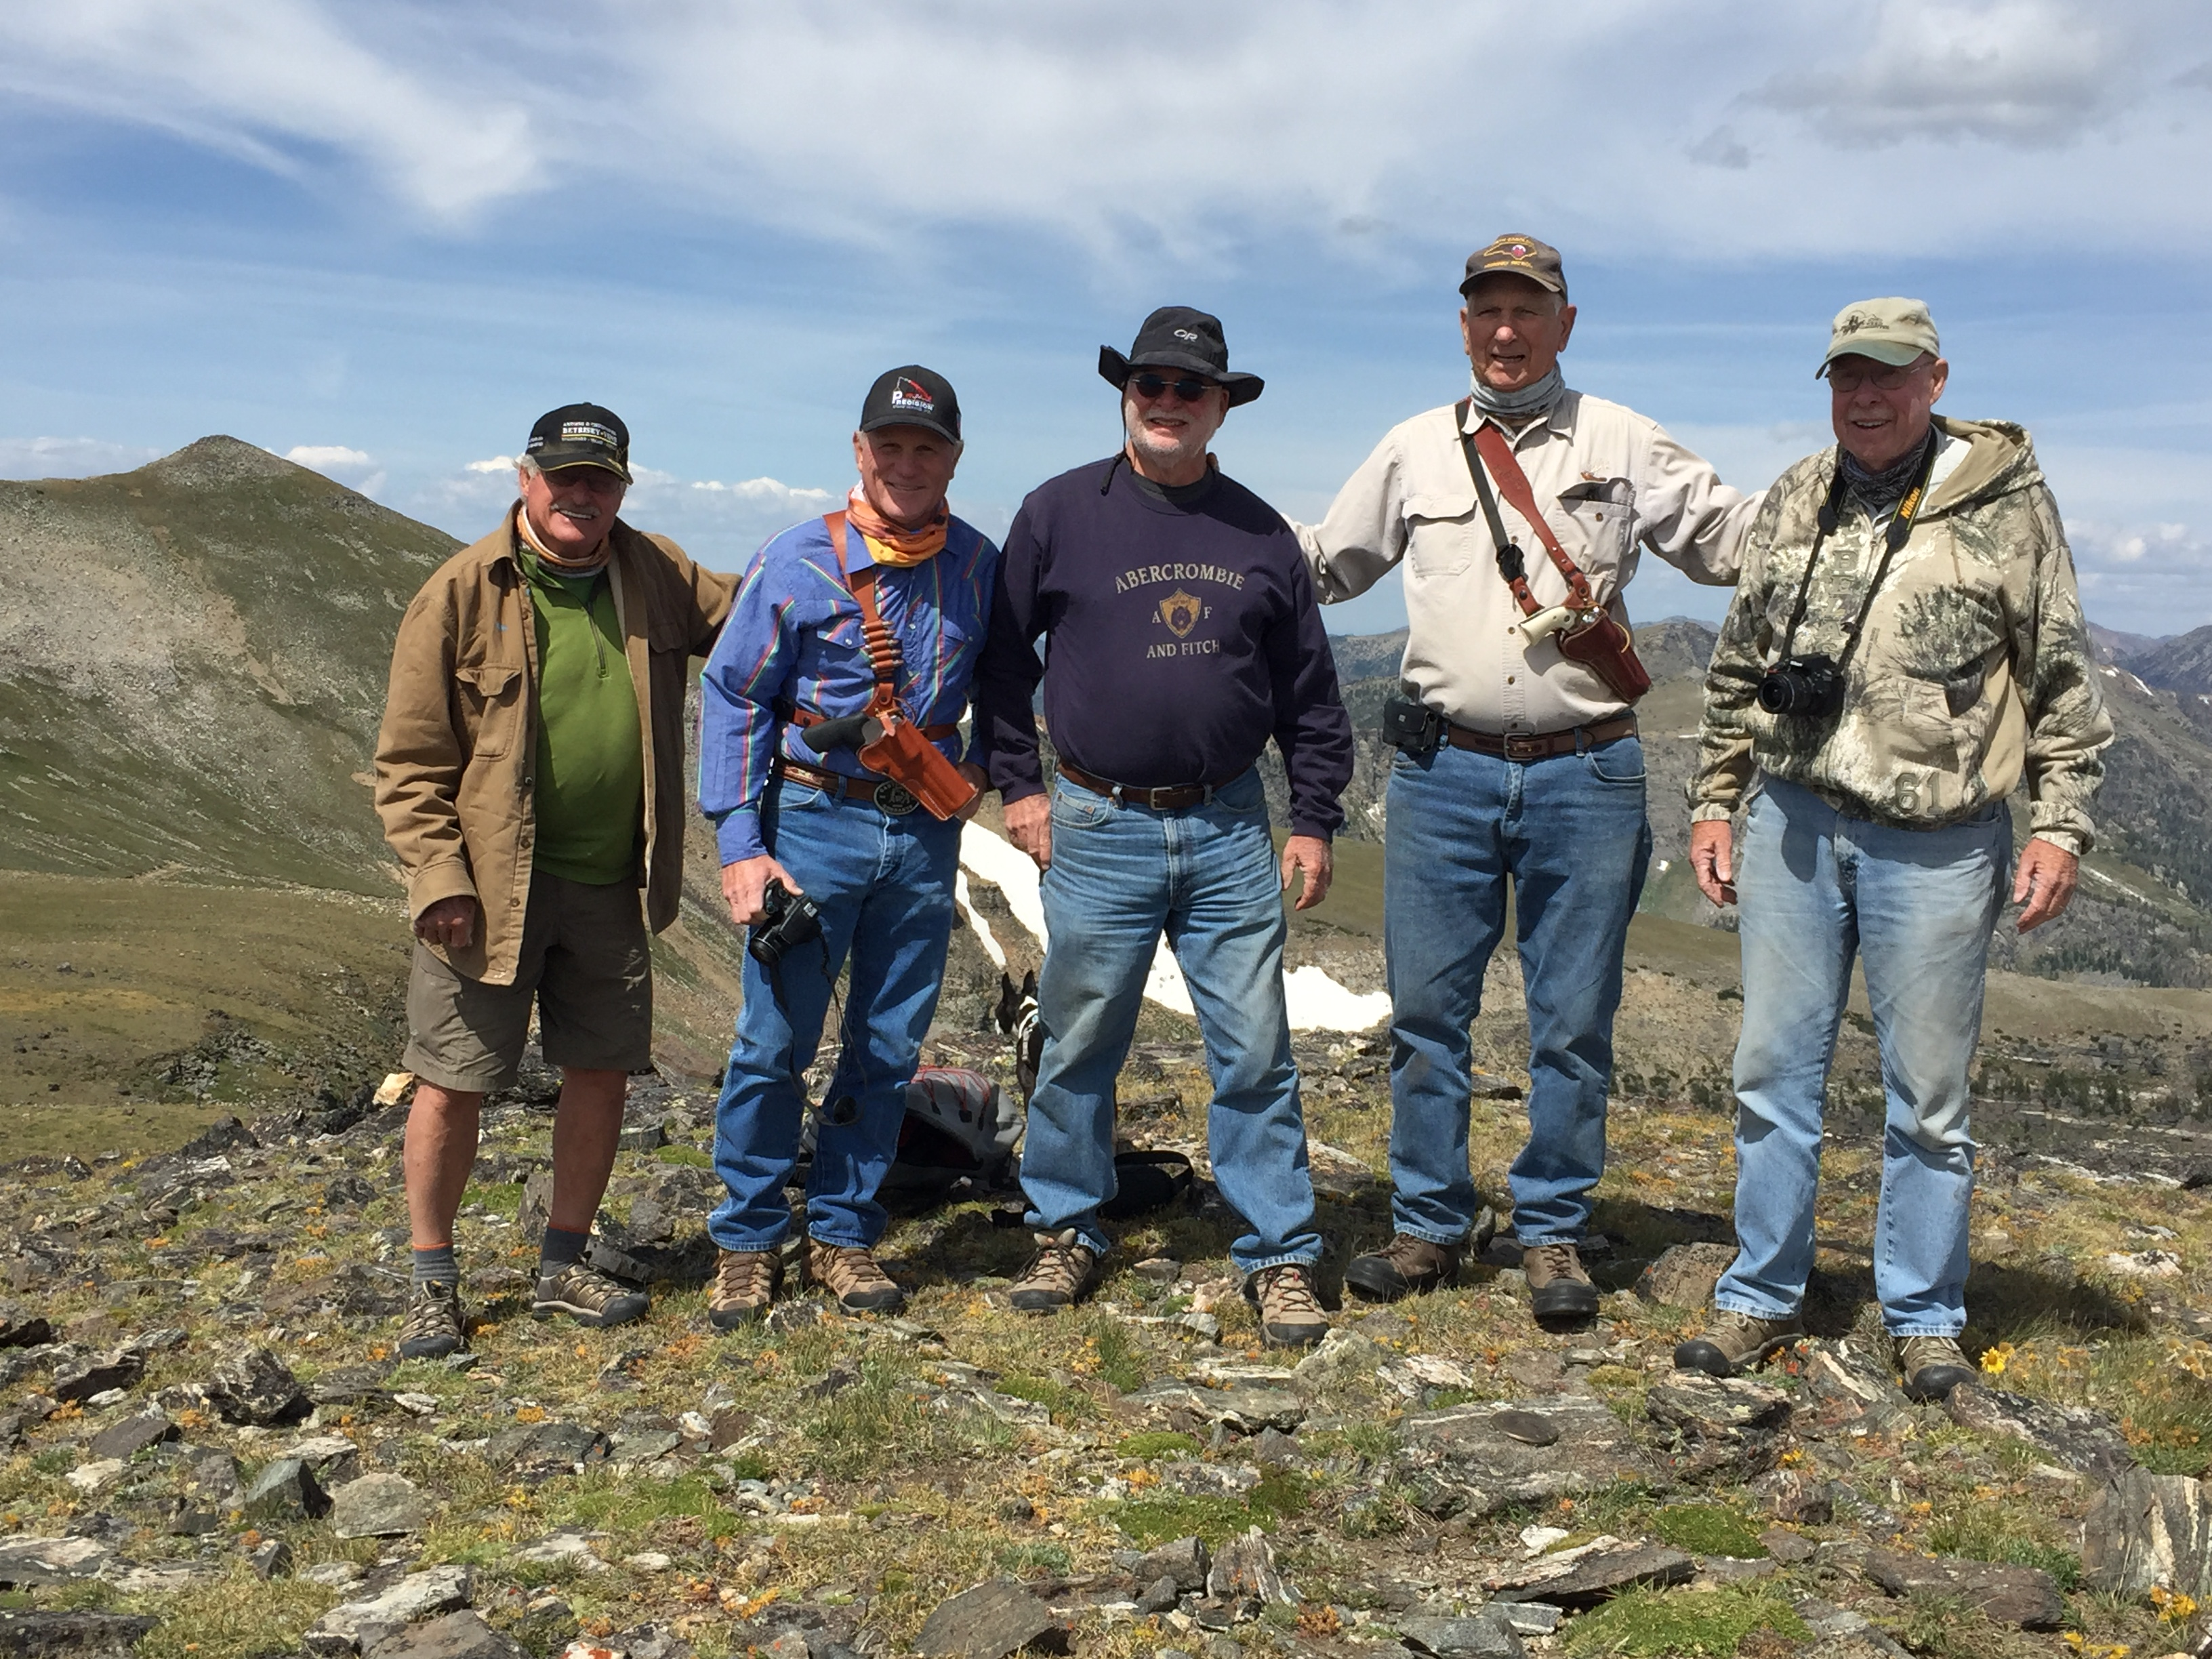 5 guys - Mt. Baldy